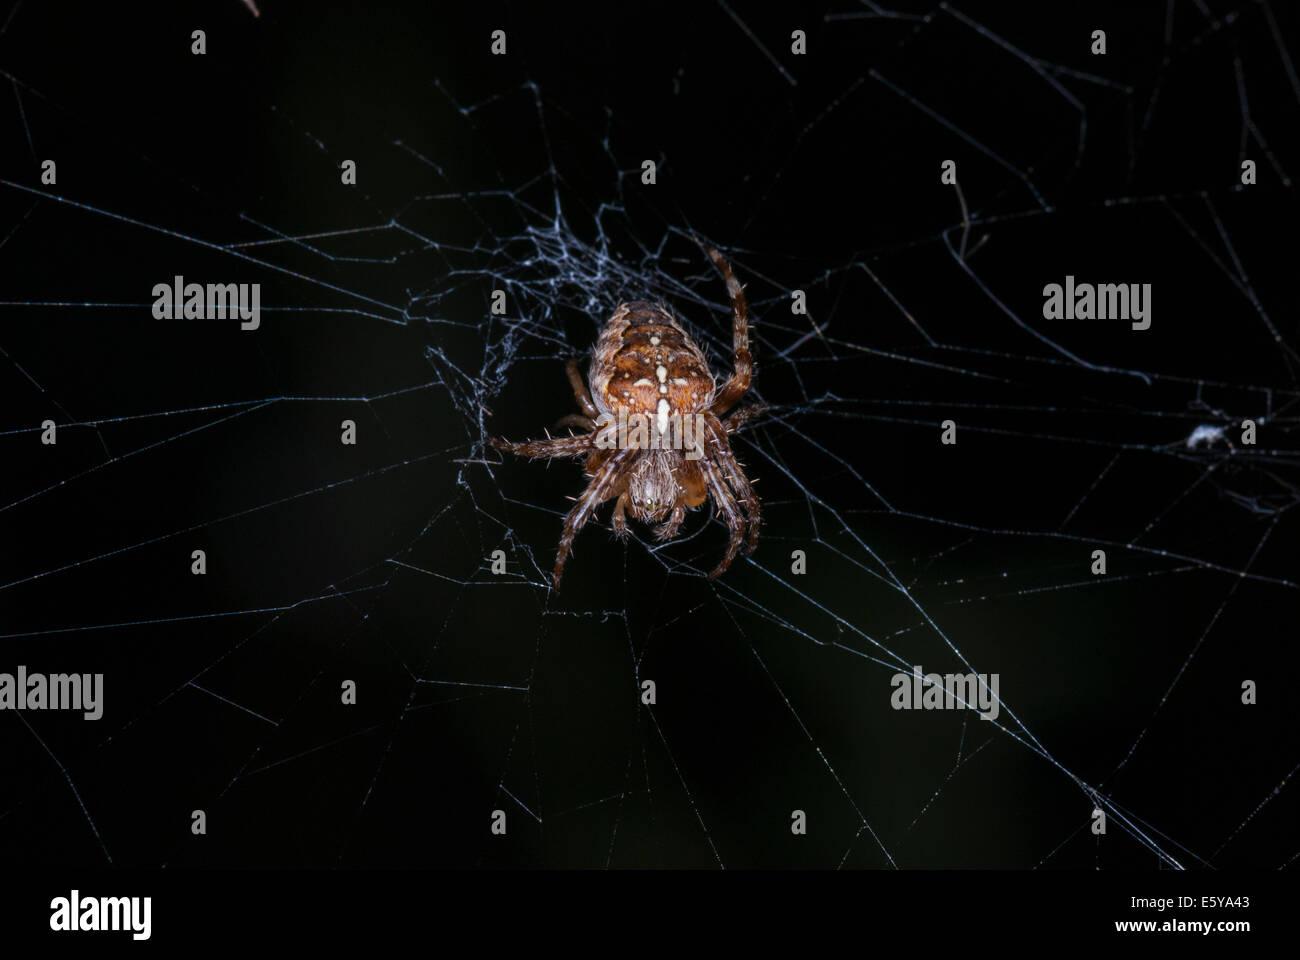 A dorsal view of a female Garden Spider, Araneus diadematus, lit up against a dark background - Stock Image